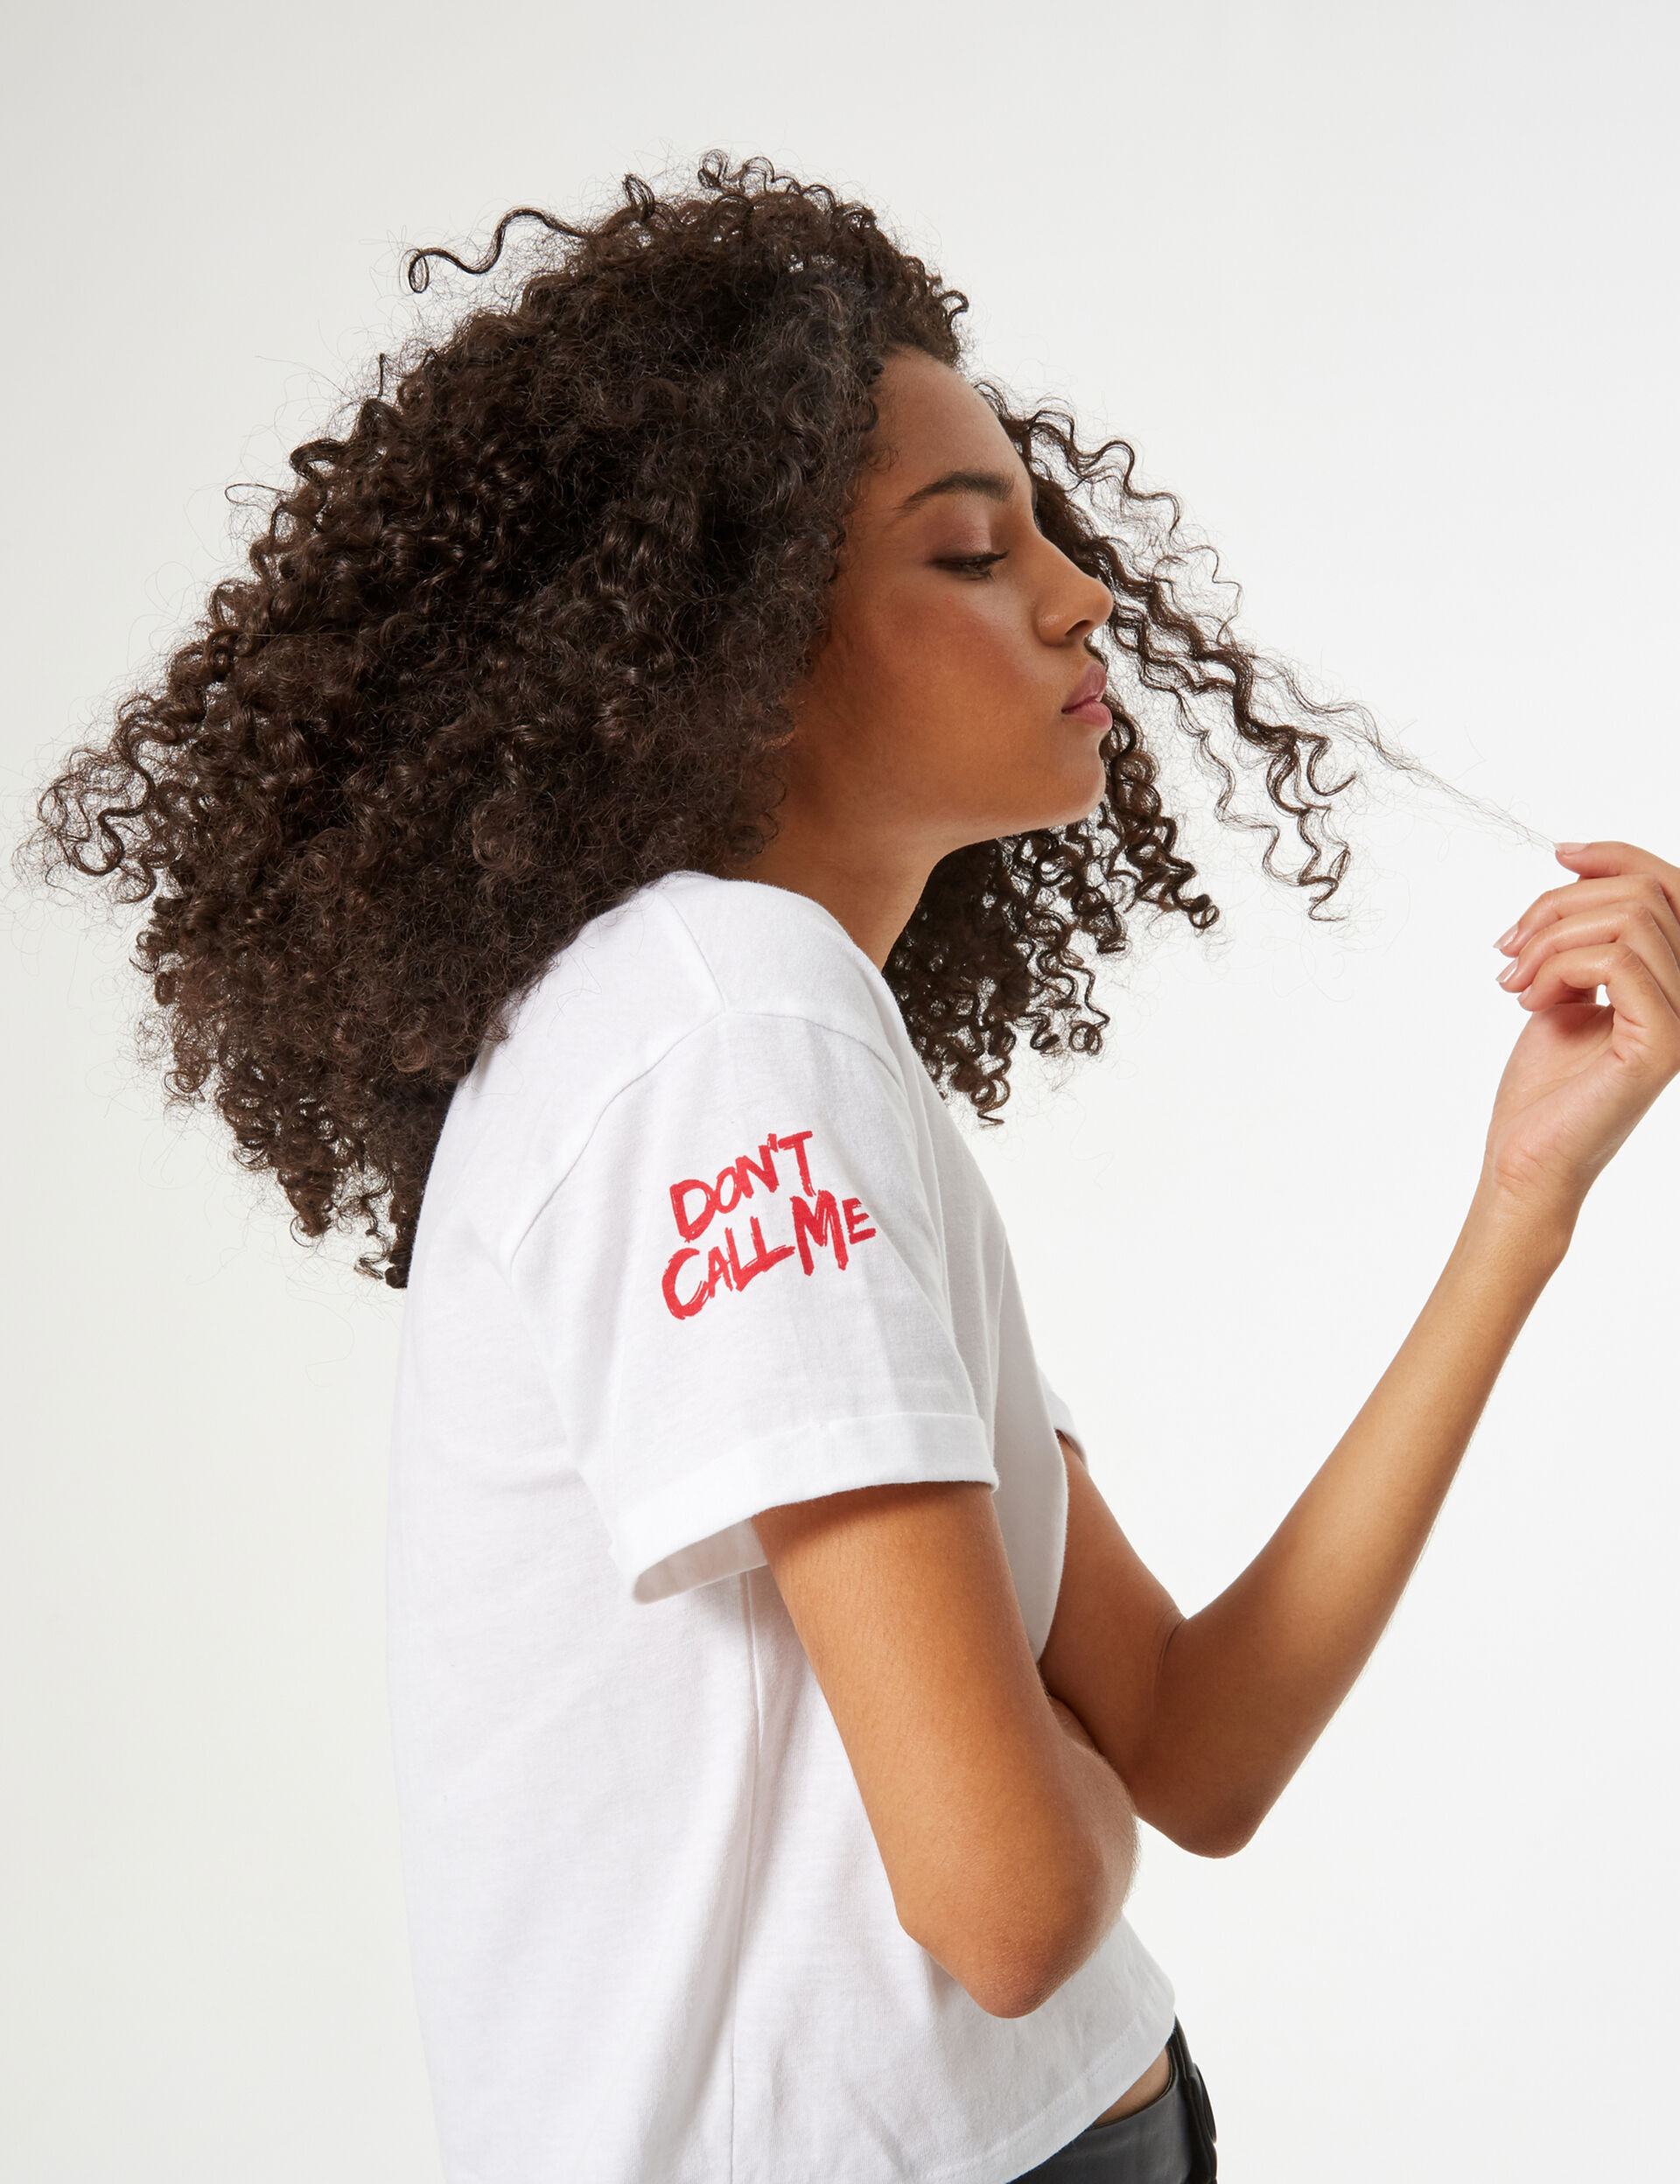 'Don't call me mocciosa' ('don't call me brat') T-shirt